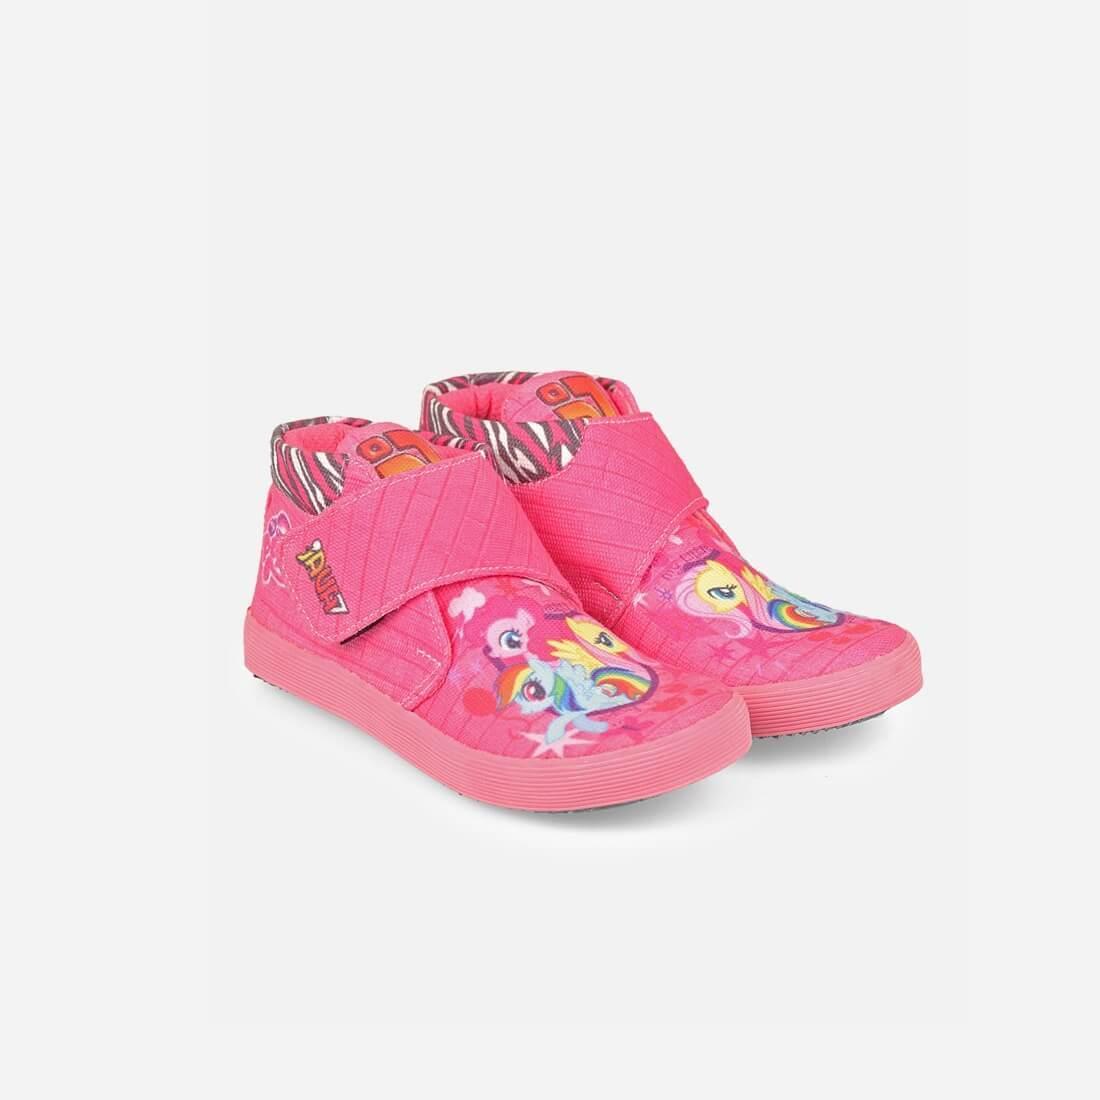 Sepatu Lukis Anak Perempuan My Little Pony JavaSeven CNZ794